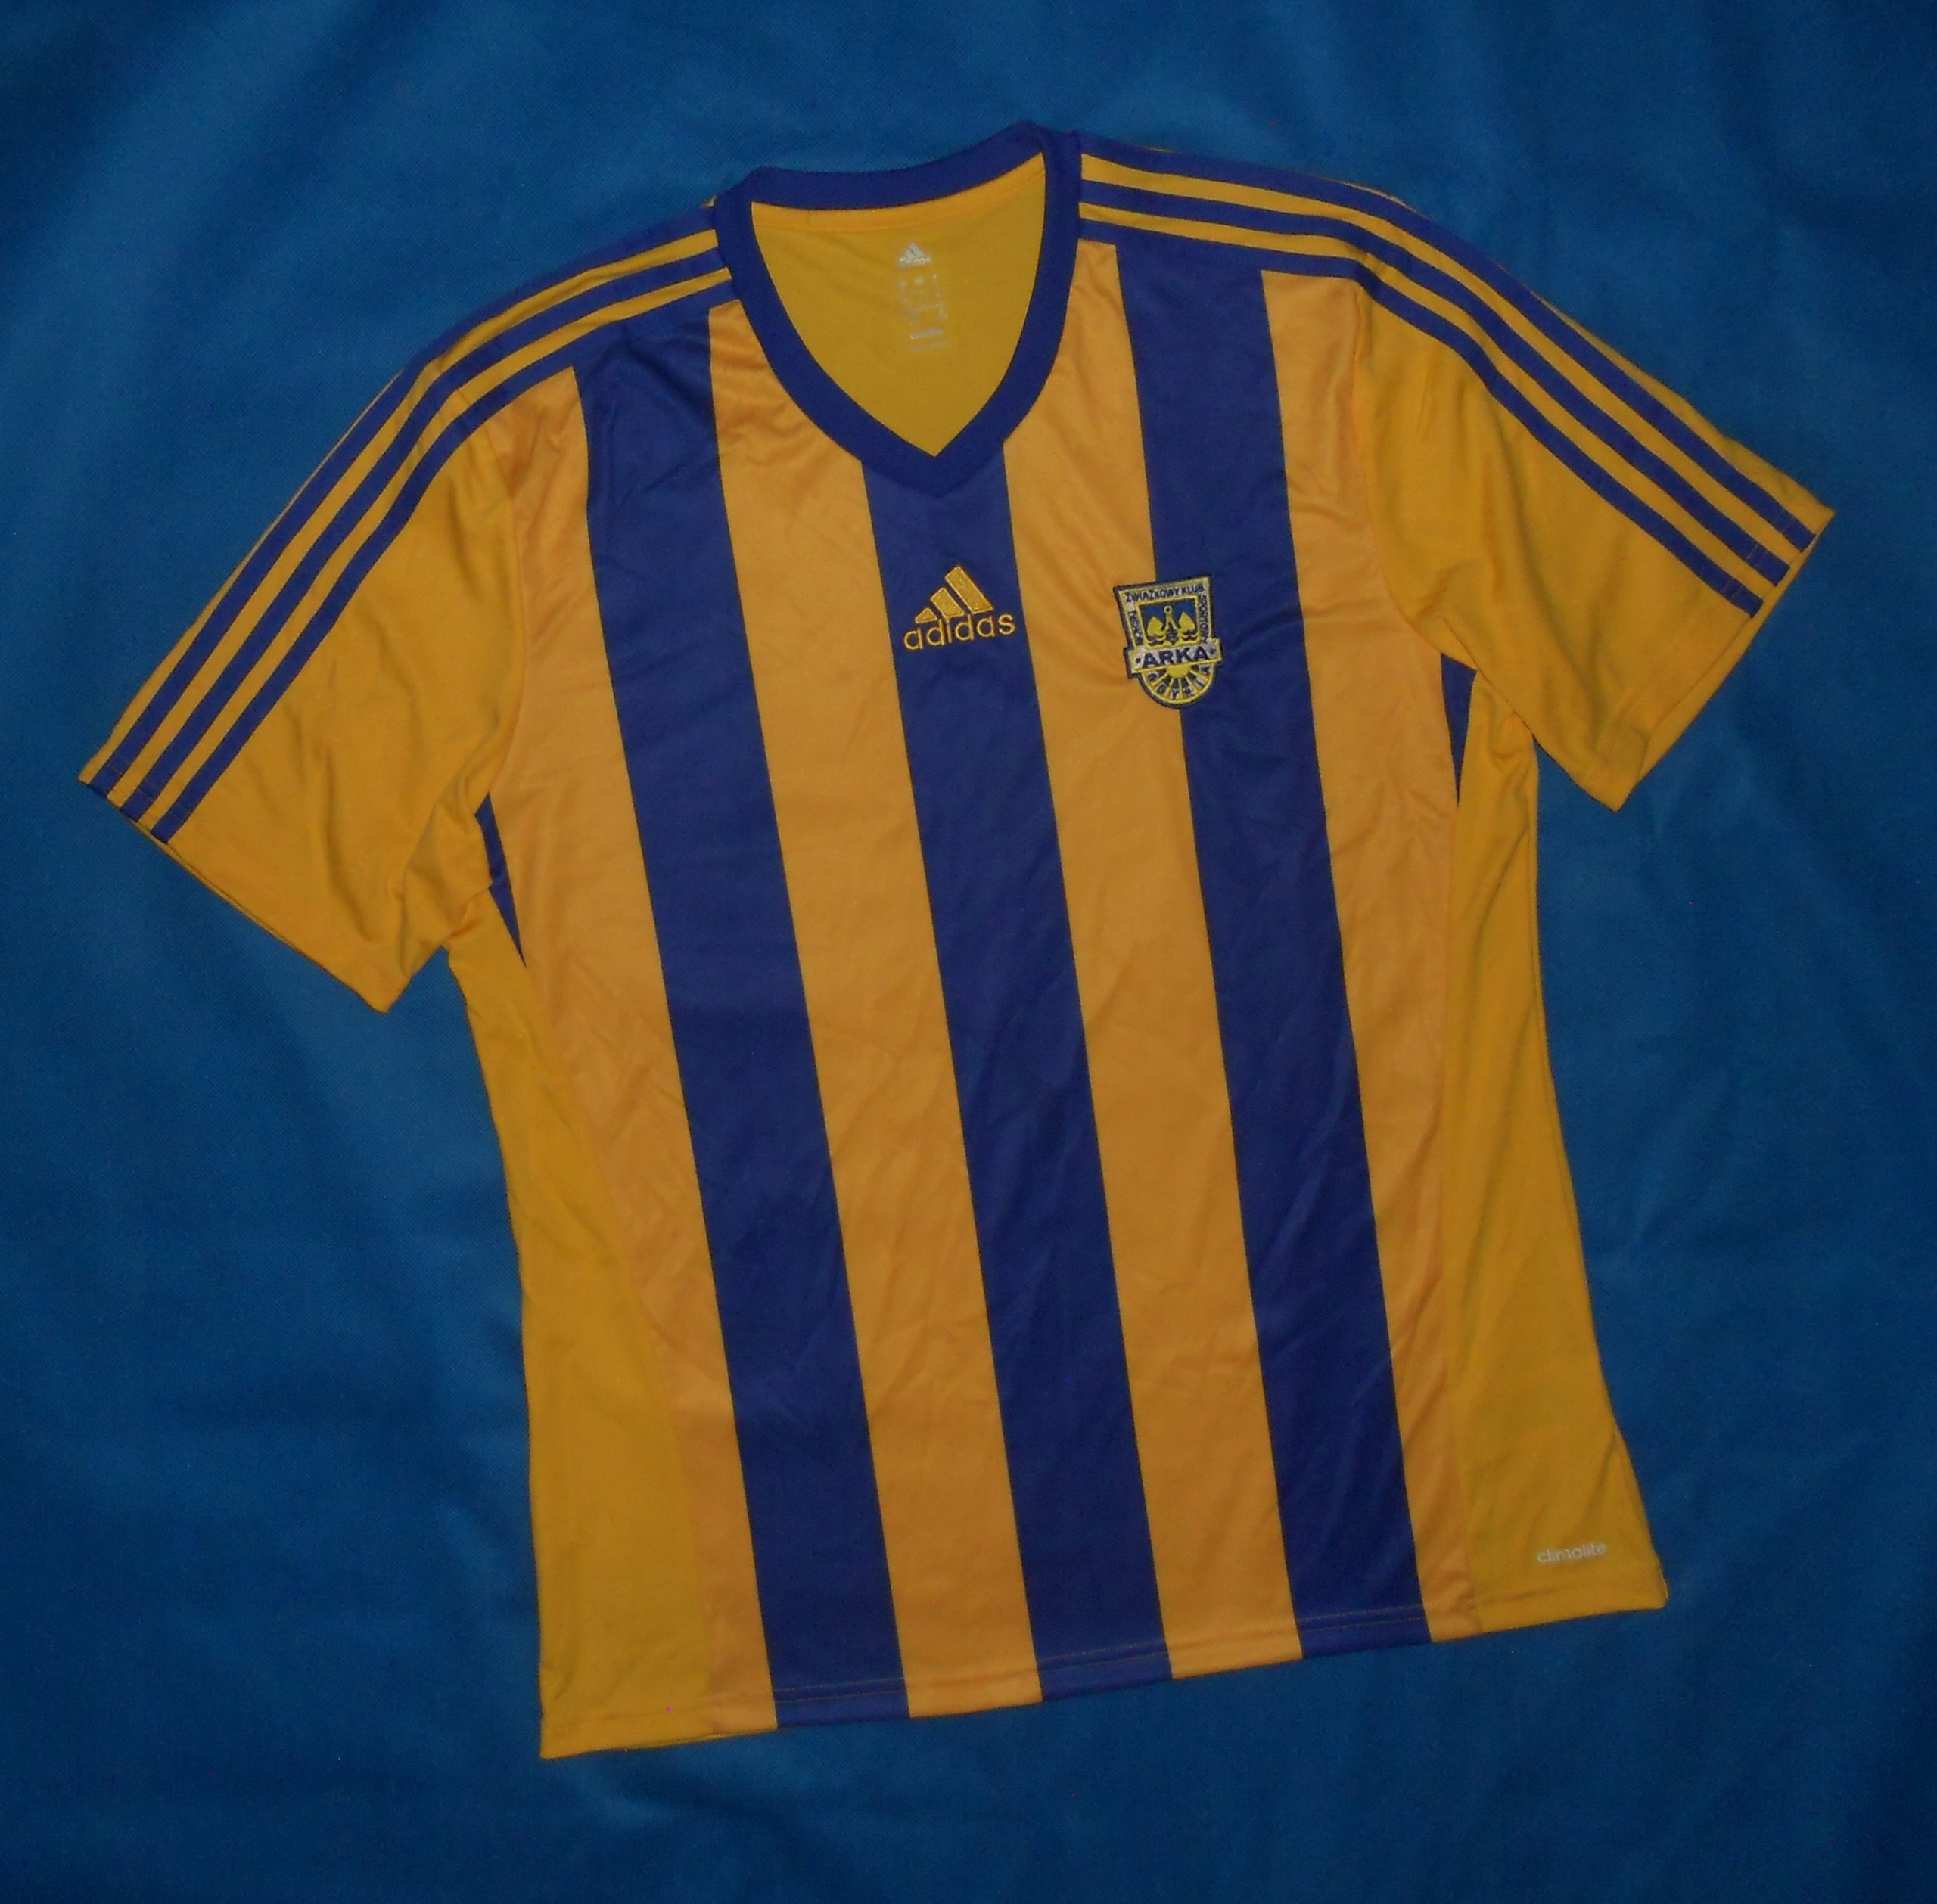 6e376095b76ad MZKS Arka Gdynia Adidas Home Shirt 2014 Unikat L - 7460505199 ...